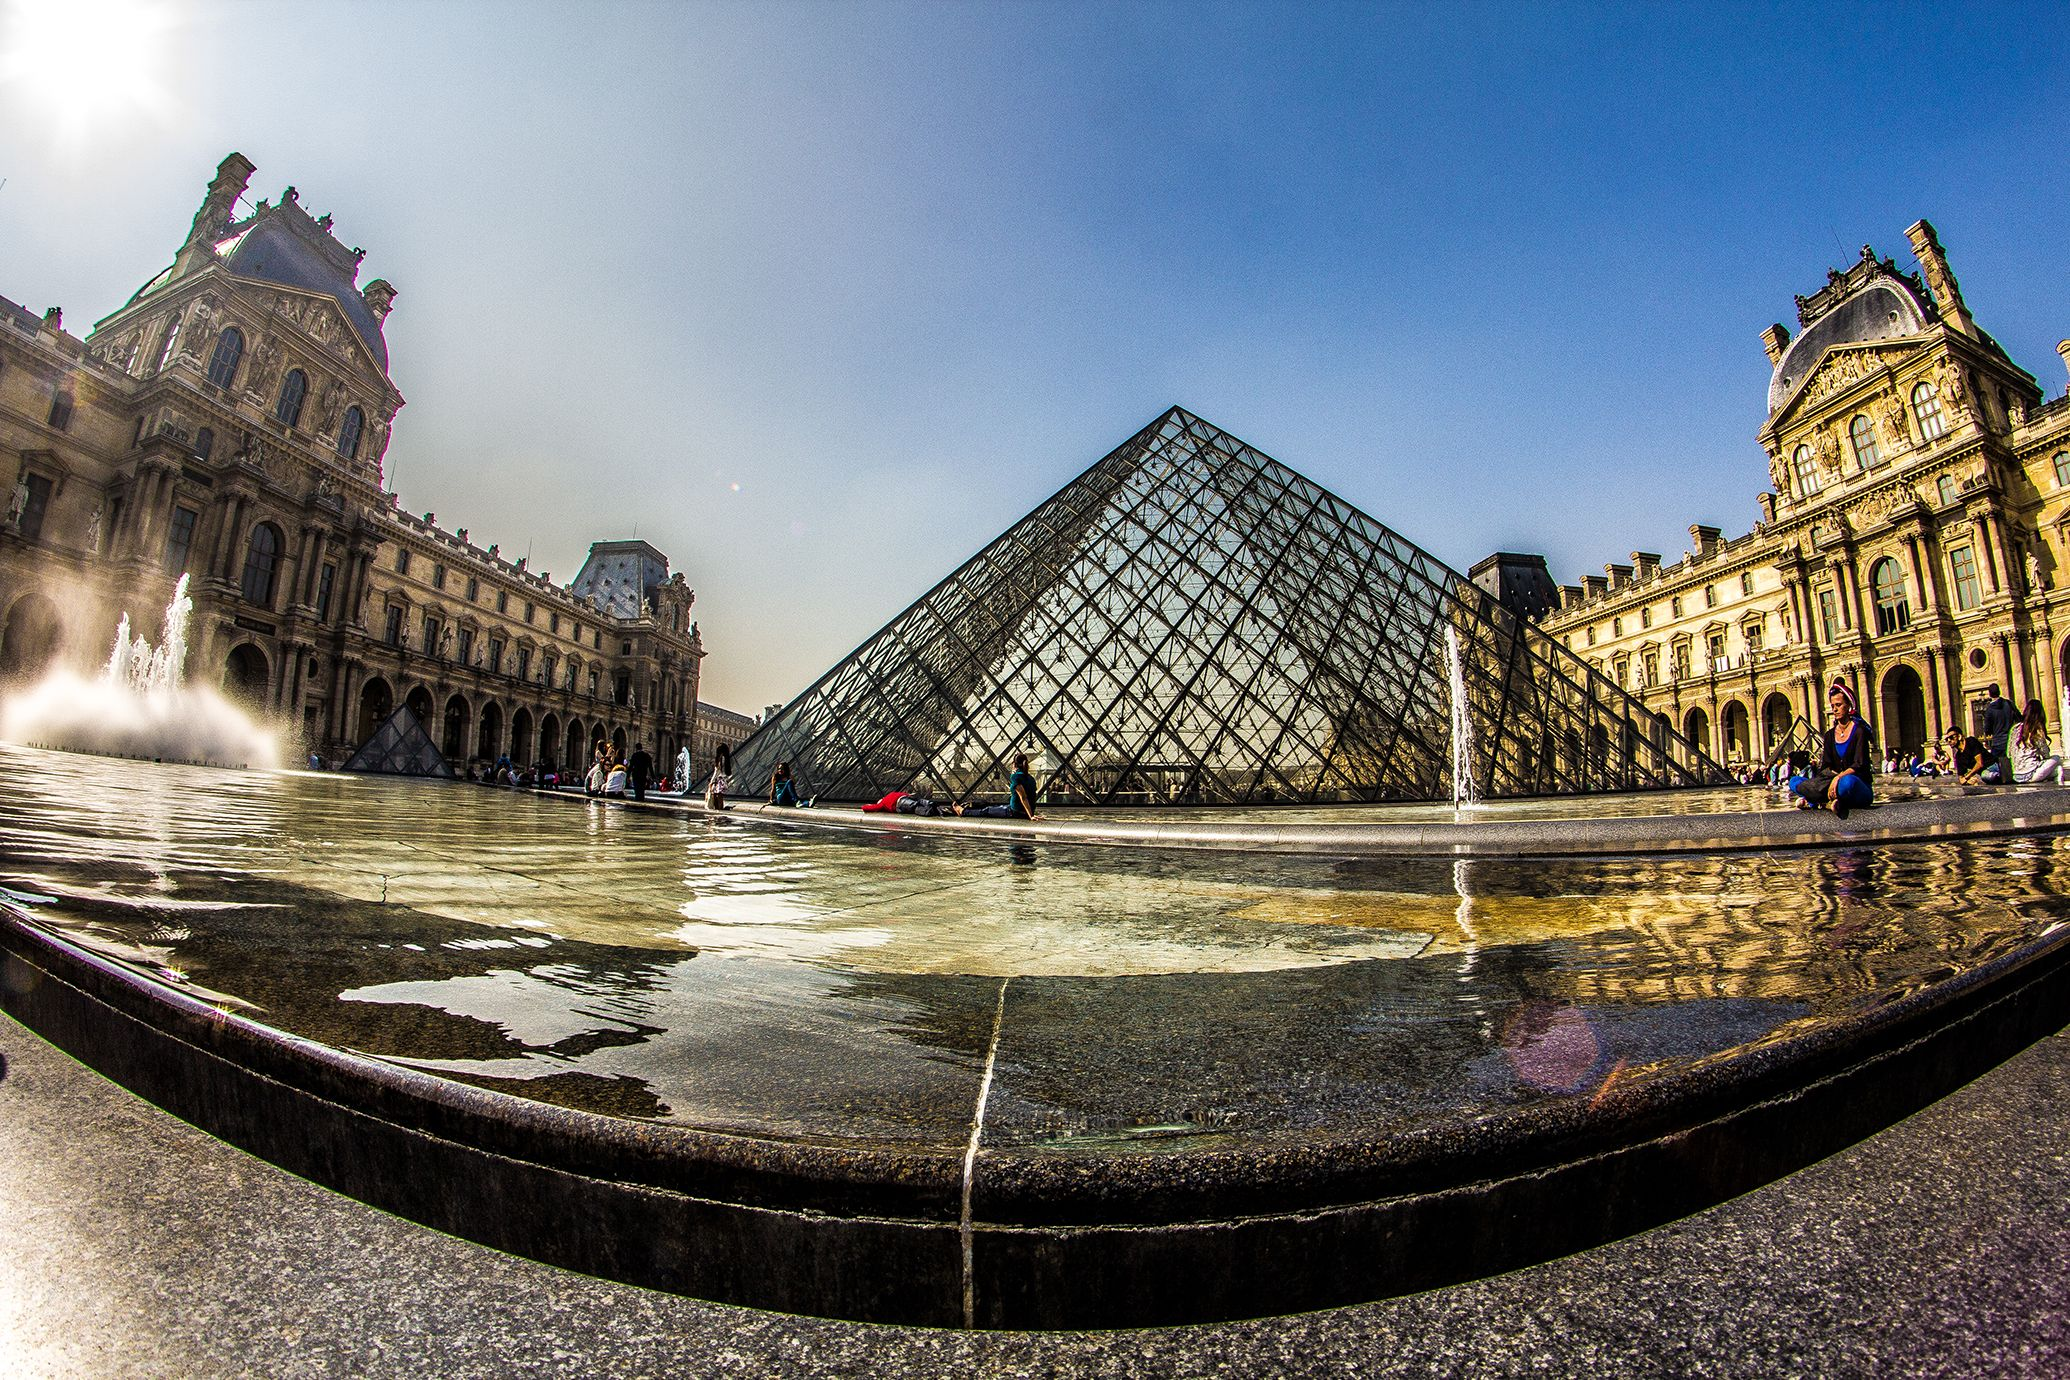 Louvre Paris Canon 60d Fisheye Lens Hdr Photography Fish Eye Lens Photography